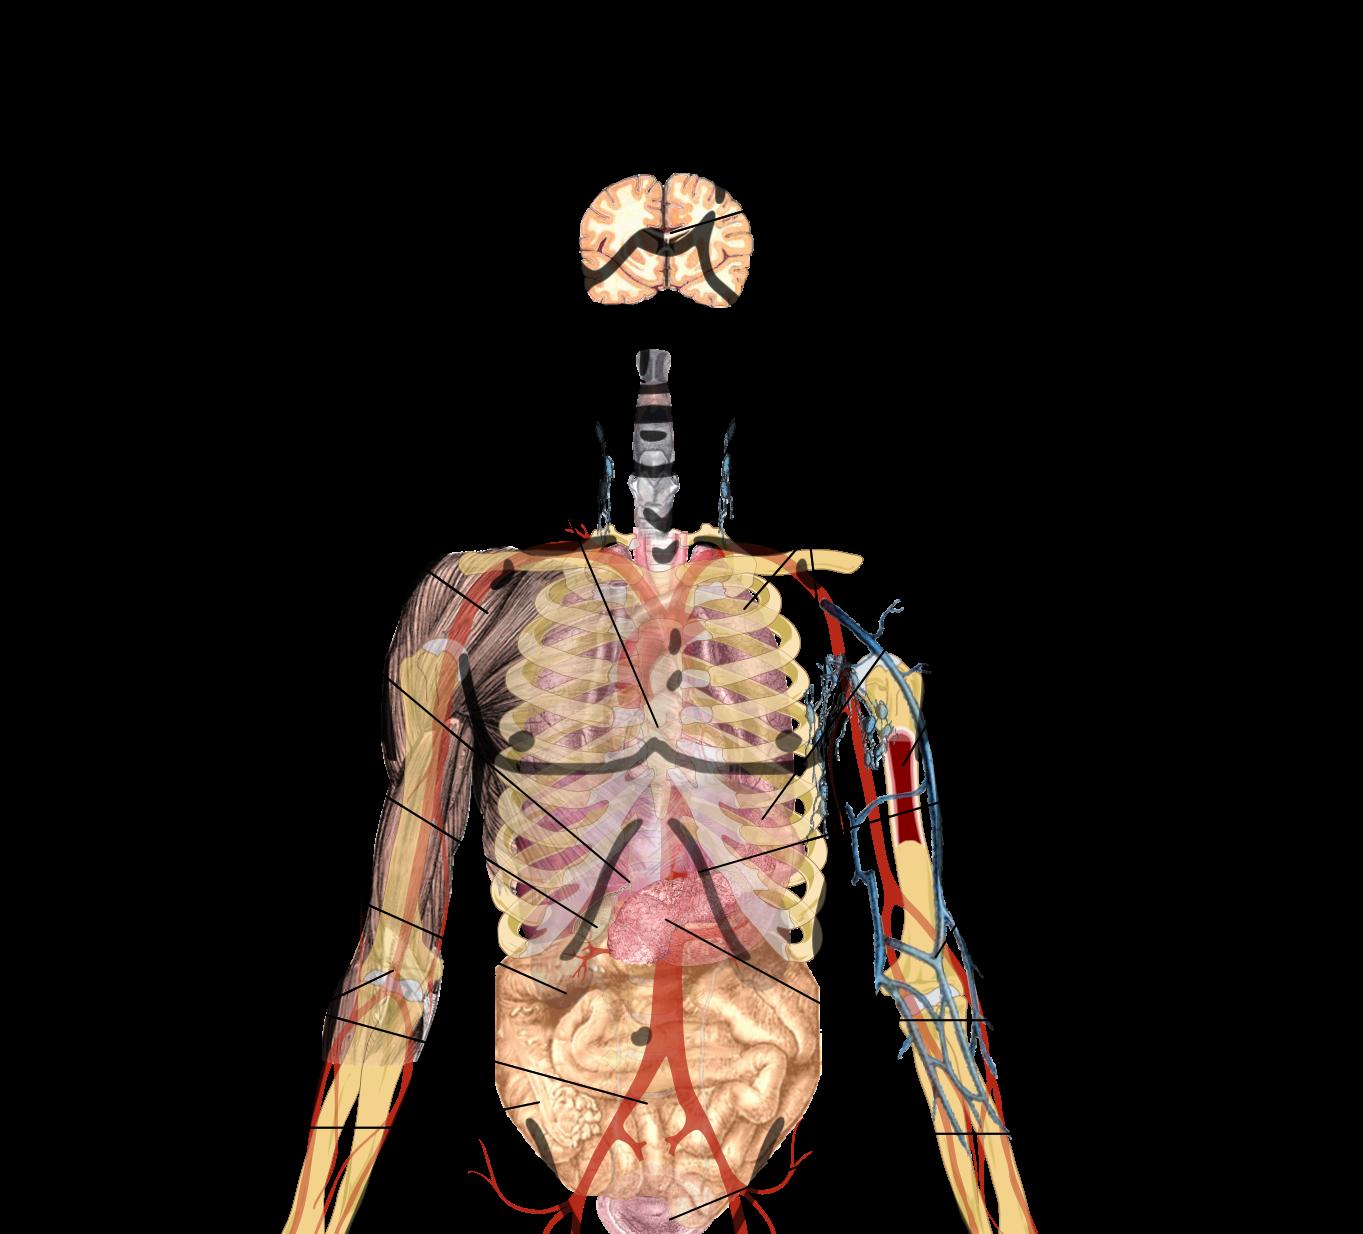 Neck clipart body part. Humbody organs drawing at